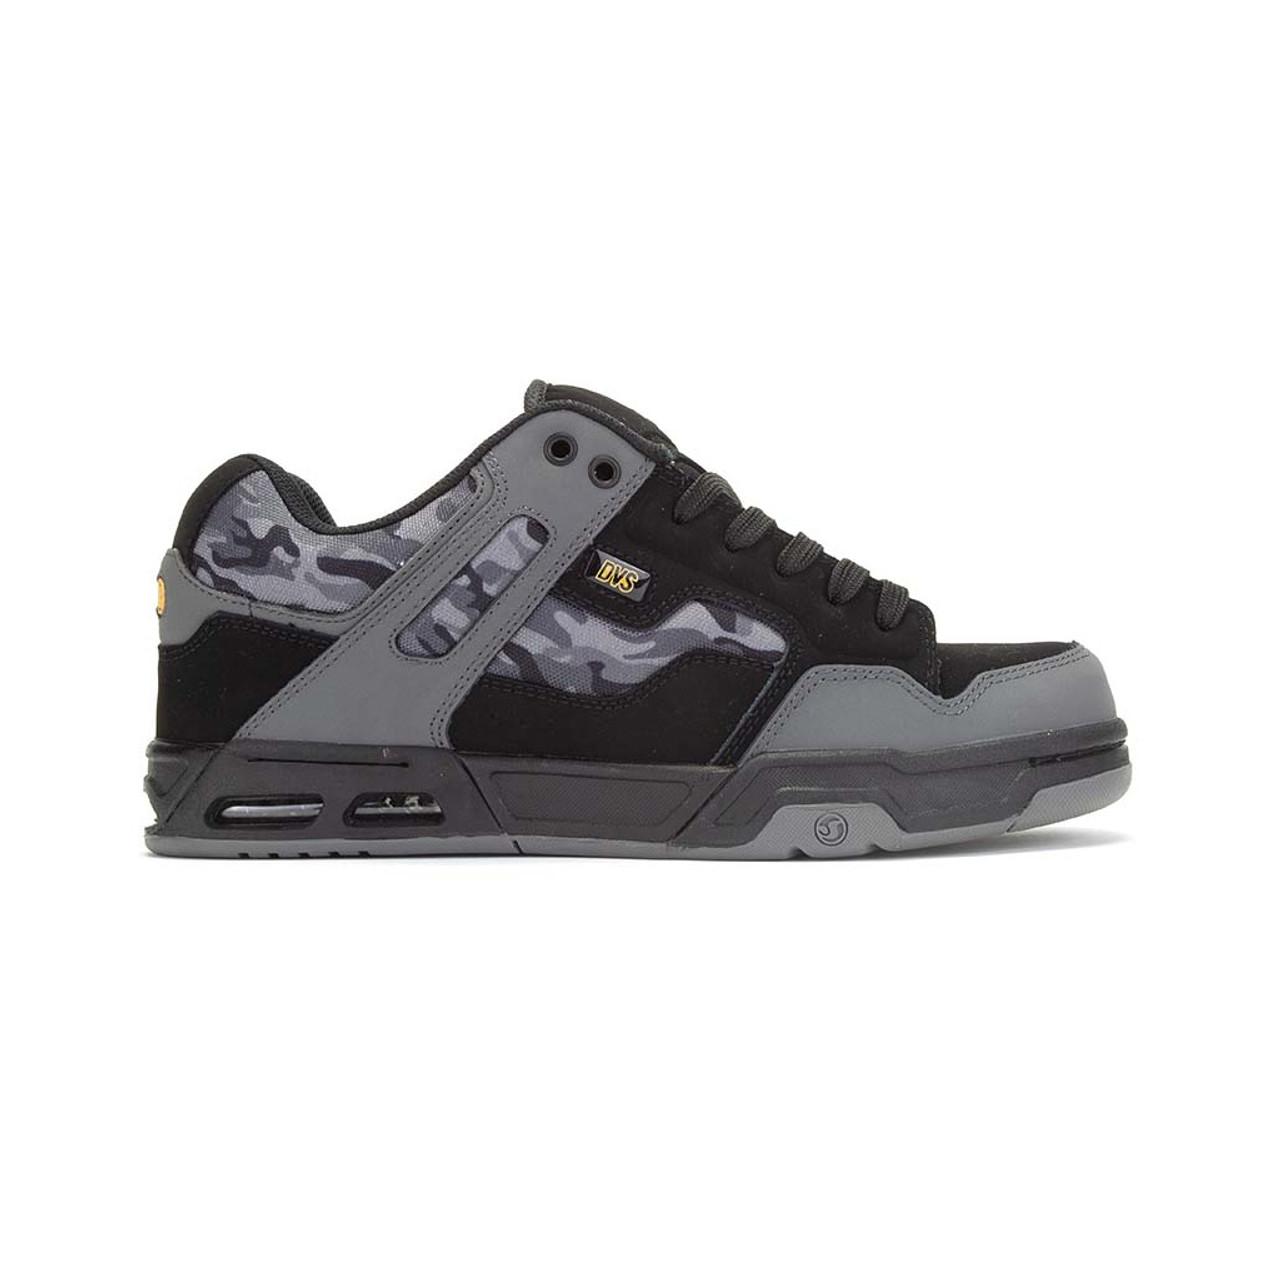 Black//Charcoal//Camo//Nubuck DVS Enduro Heir Shoes